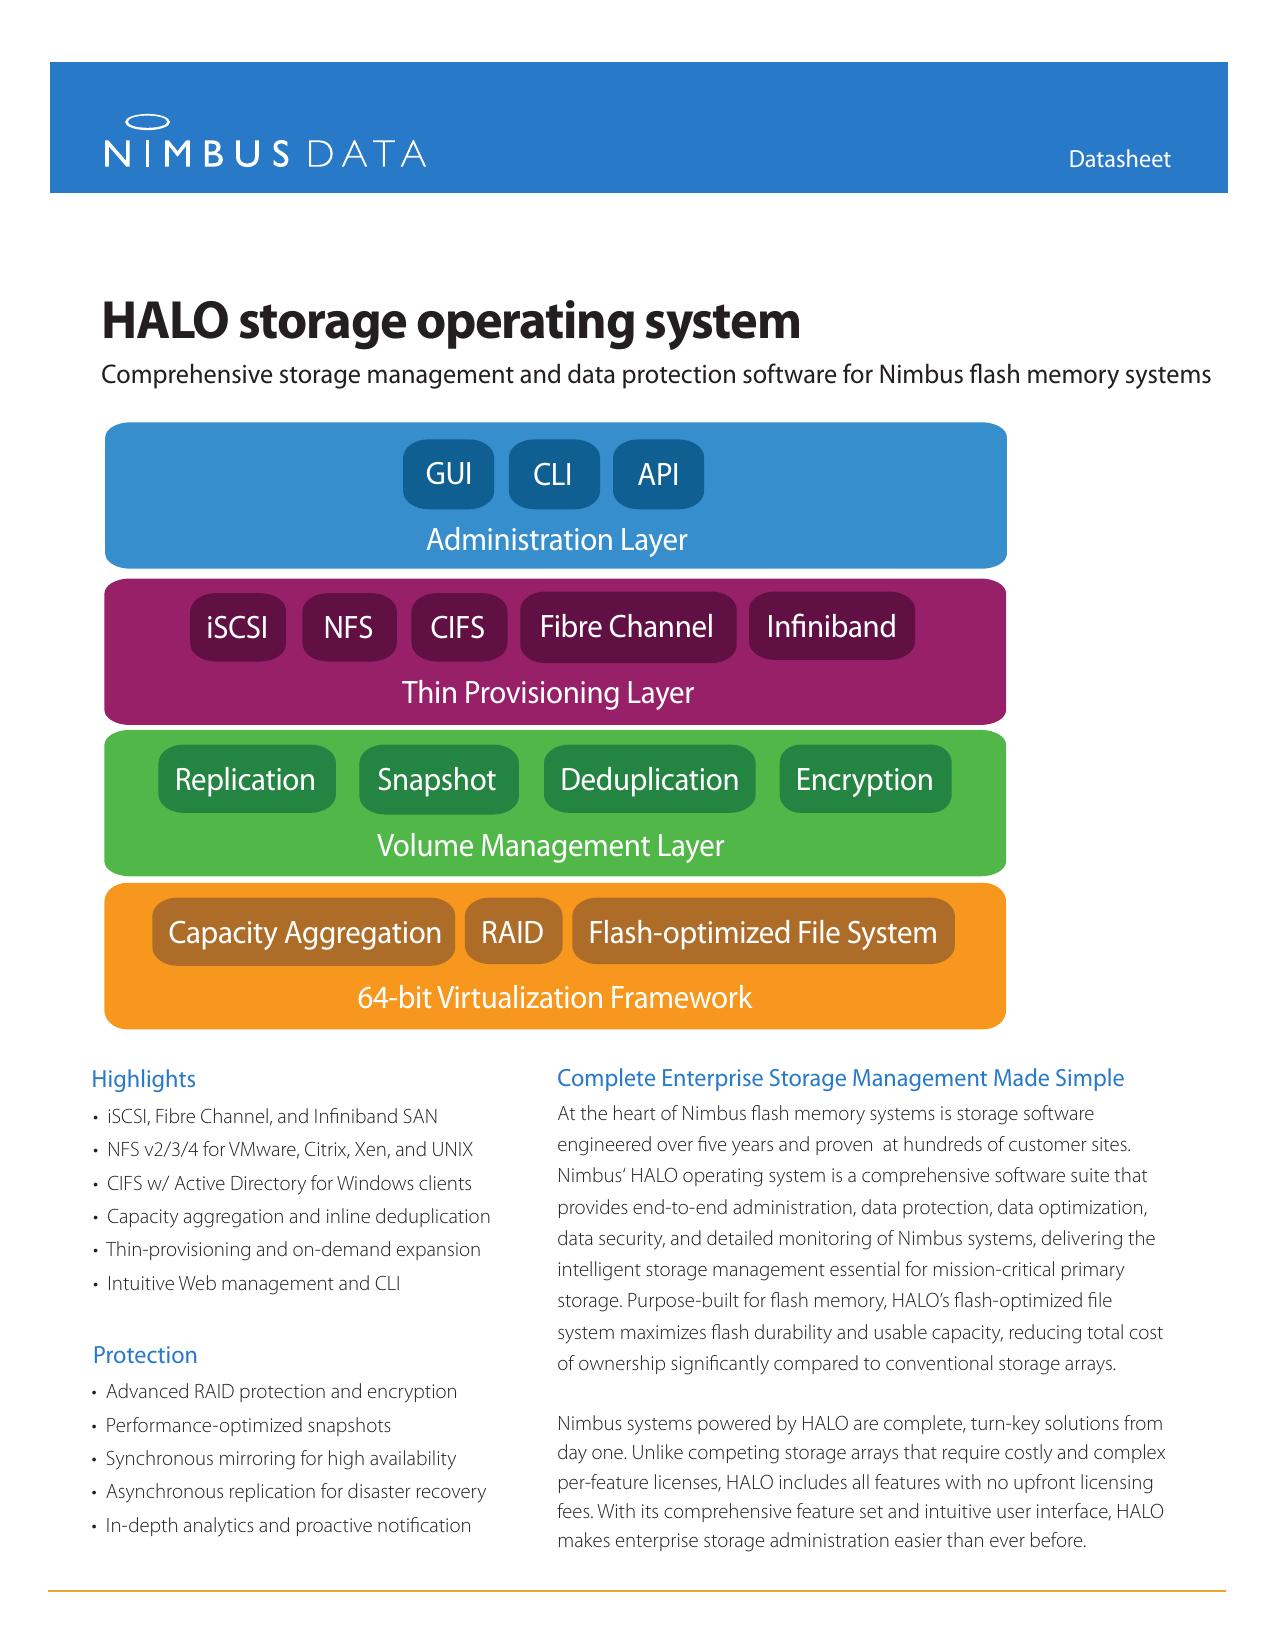 magasin en ligne c7e90 731b7 Nimbus Data HALO Operating System Data Sheet   manualzz.com